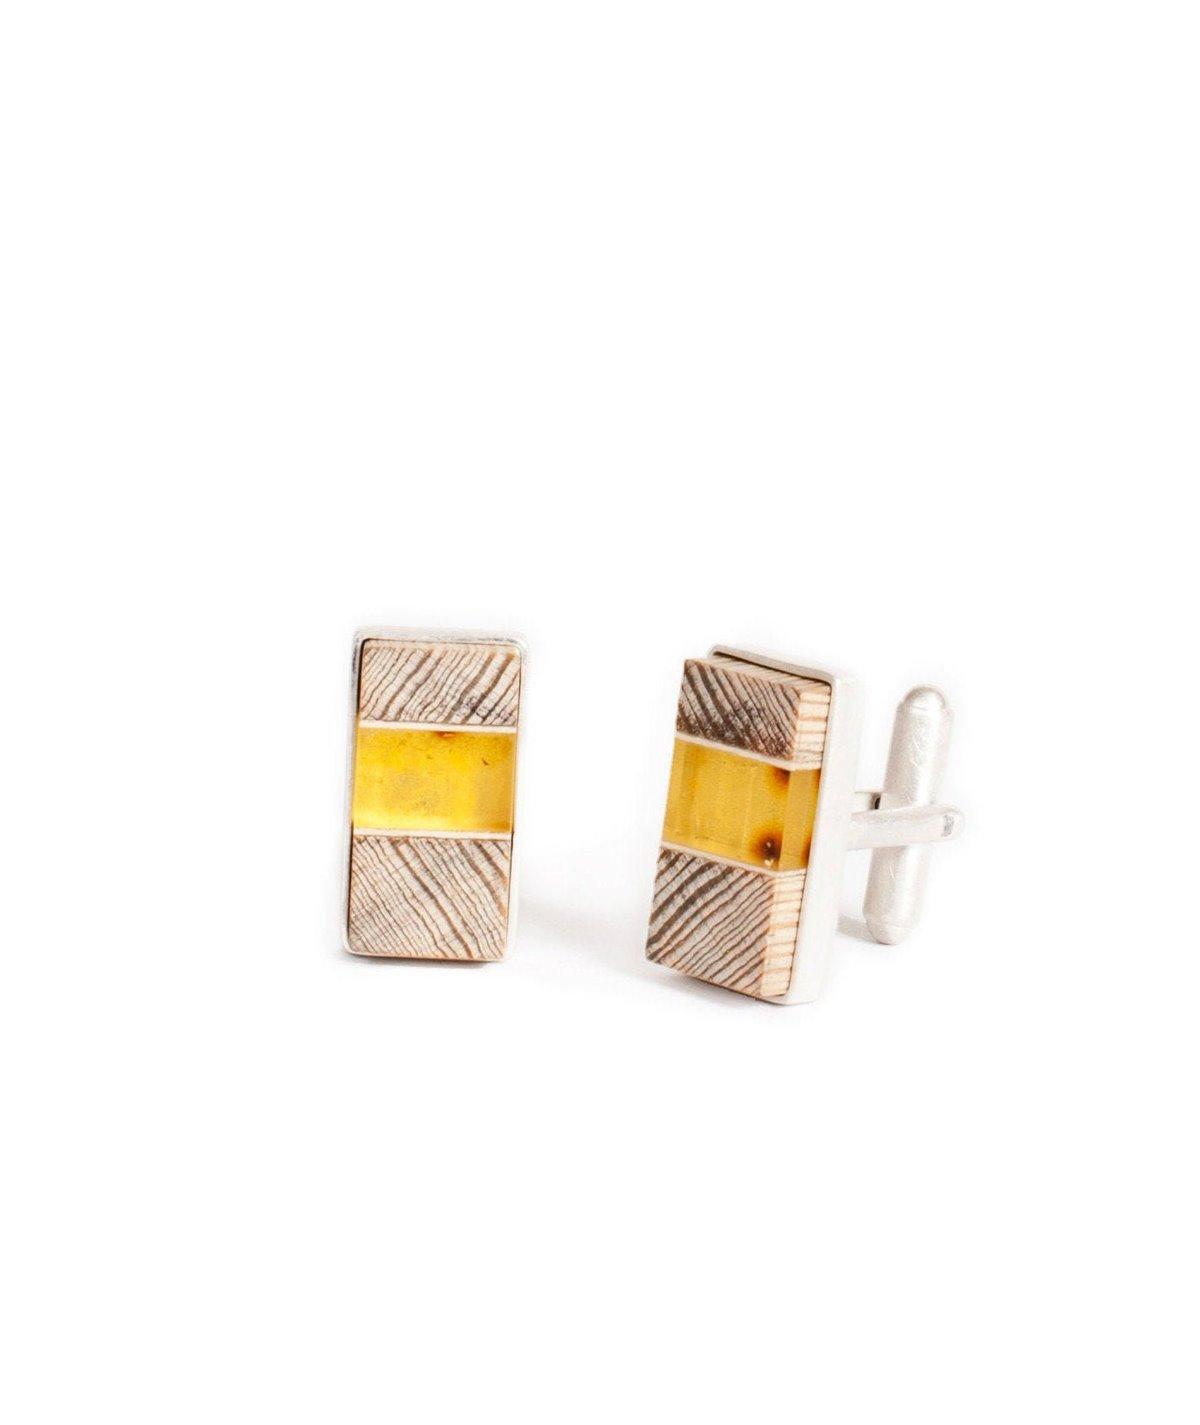 Cufflinks baltic amber + driftwood + sterling silver, handmade by Amberwood Marta Wlodarska